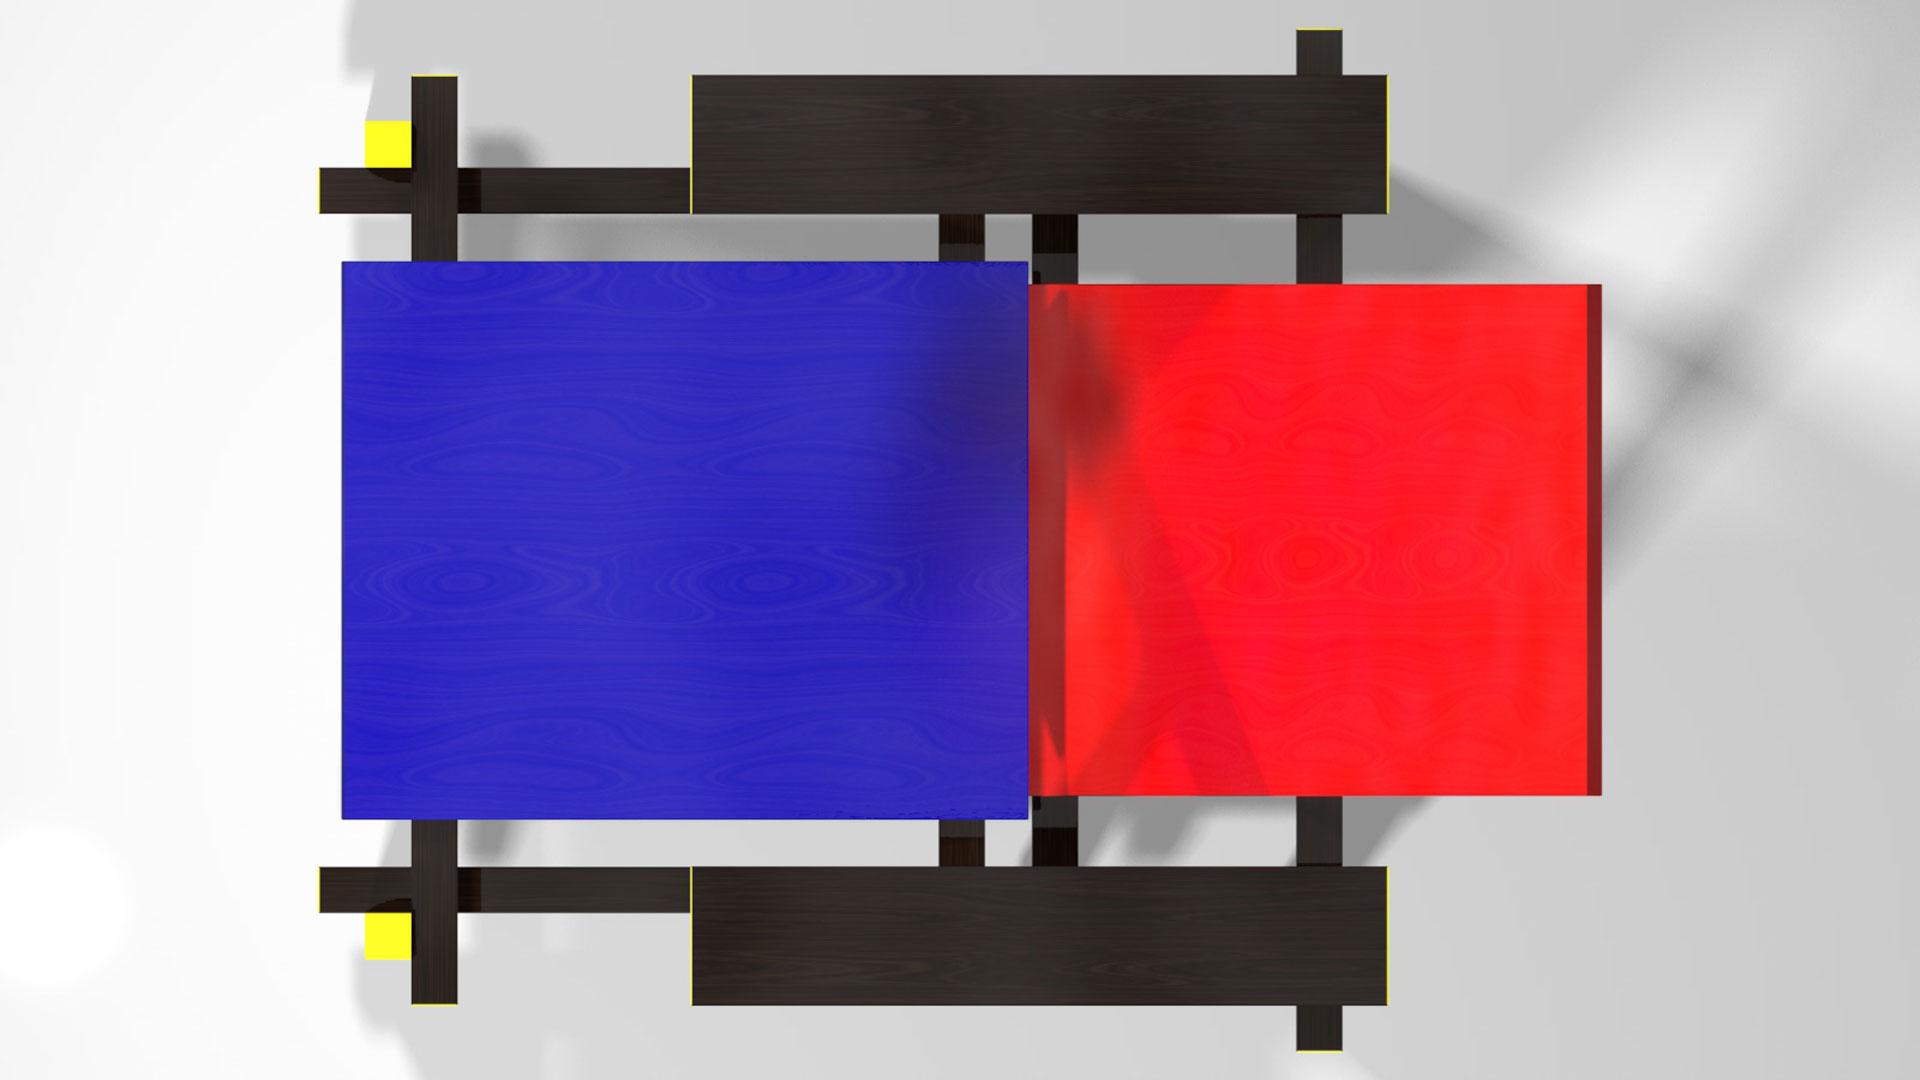 Pin piet mondriaan on pinterest - Chaise rouge et bleue ...